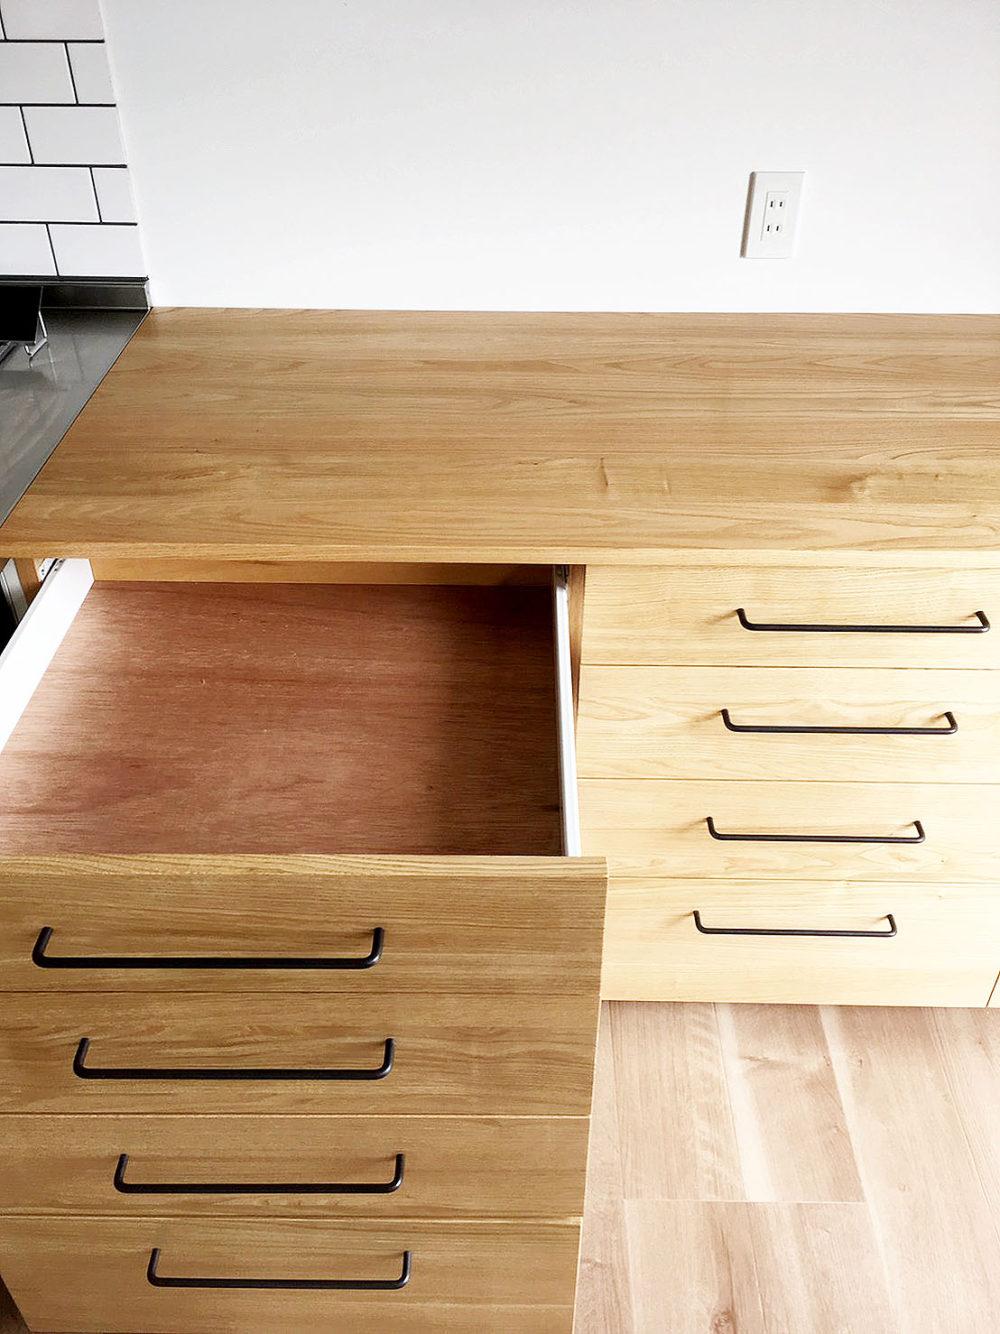 オーダー家具・食器棚/関西・和歌山